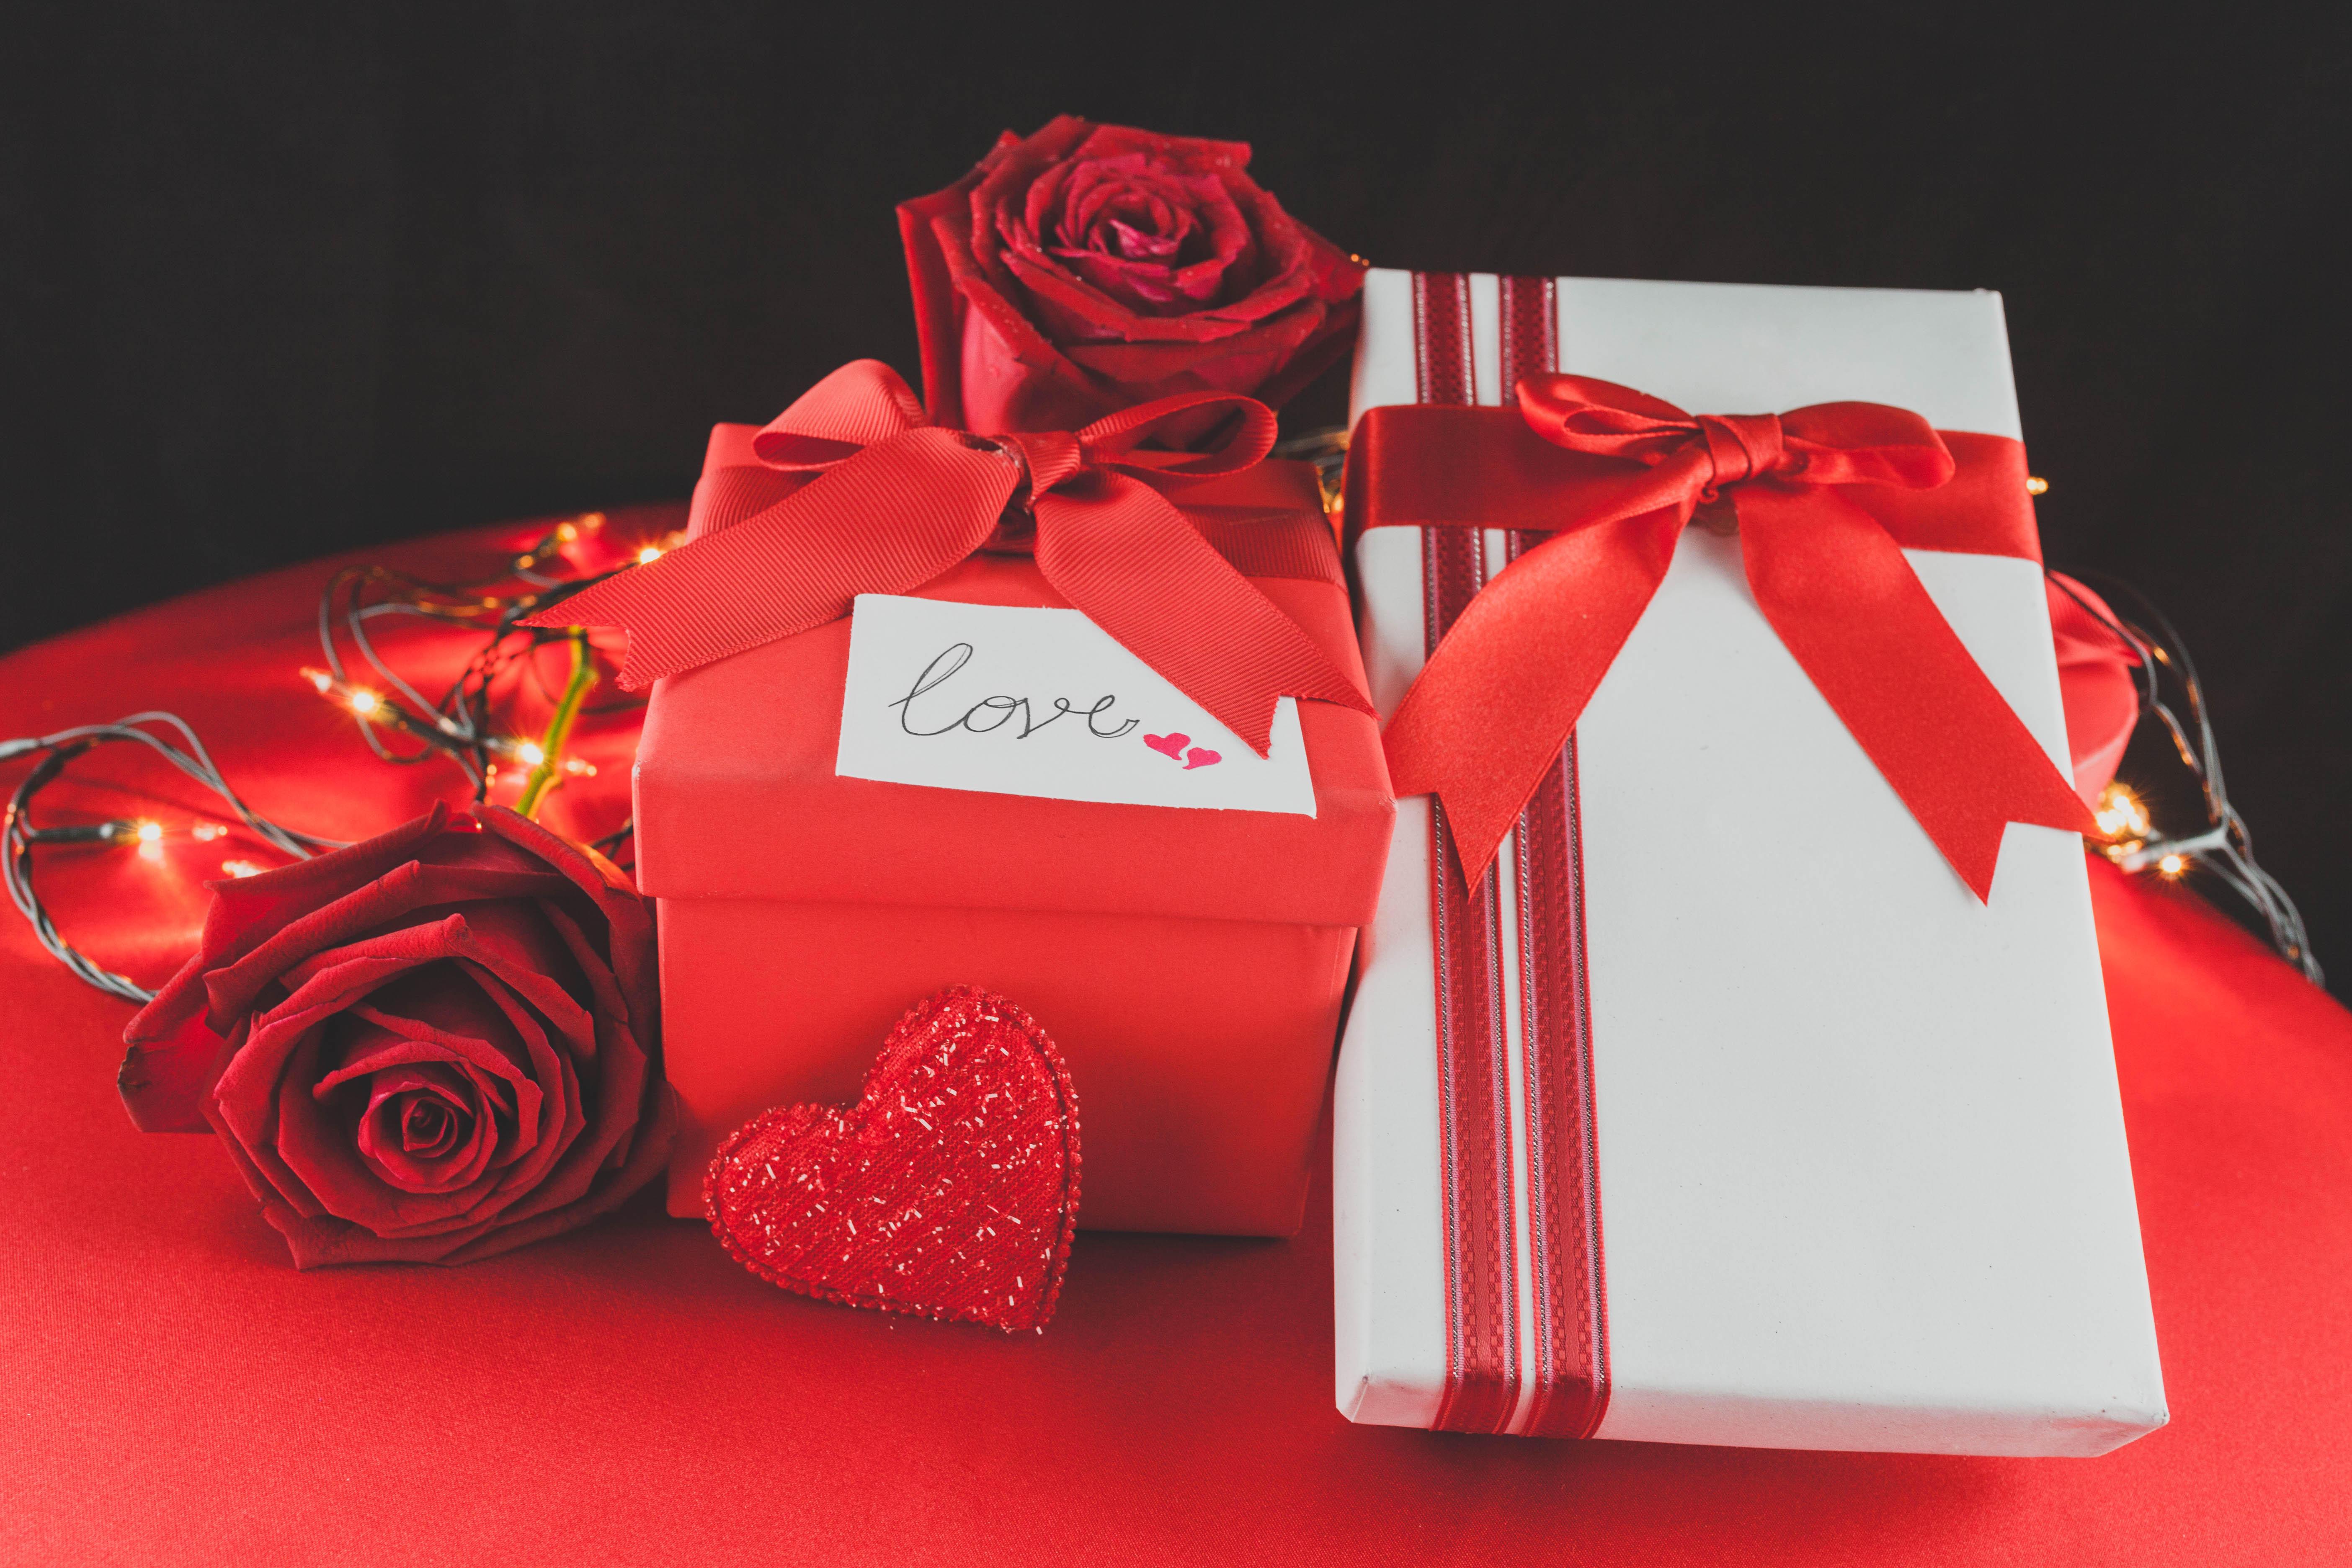 paperb valentine day gift - HD5616×3744